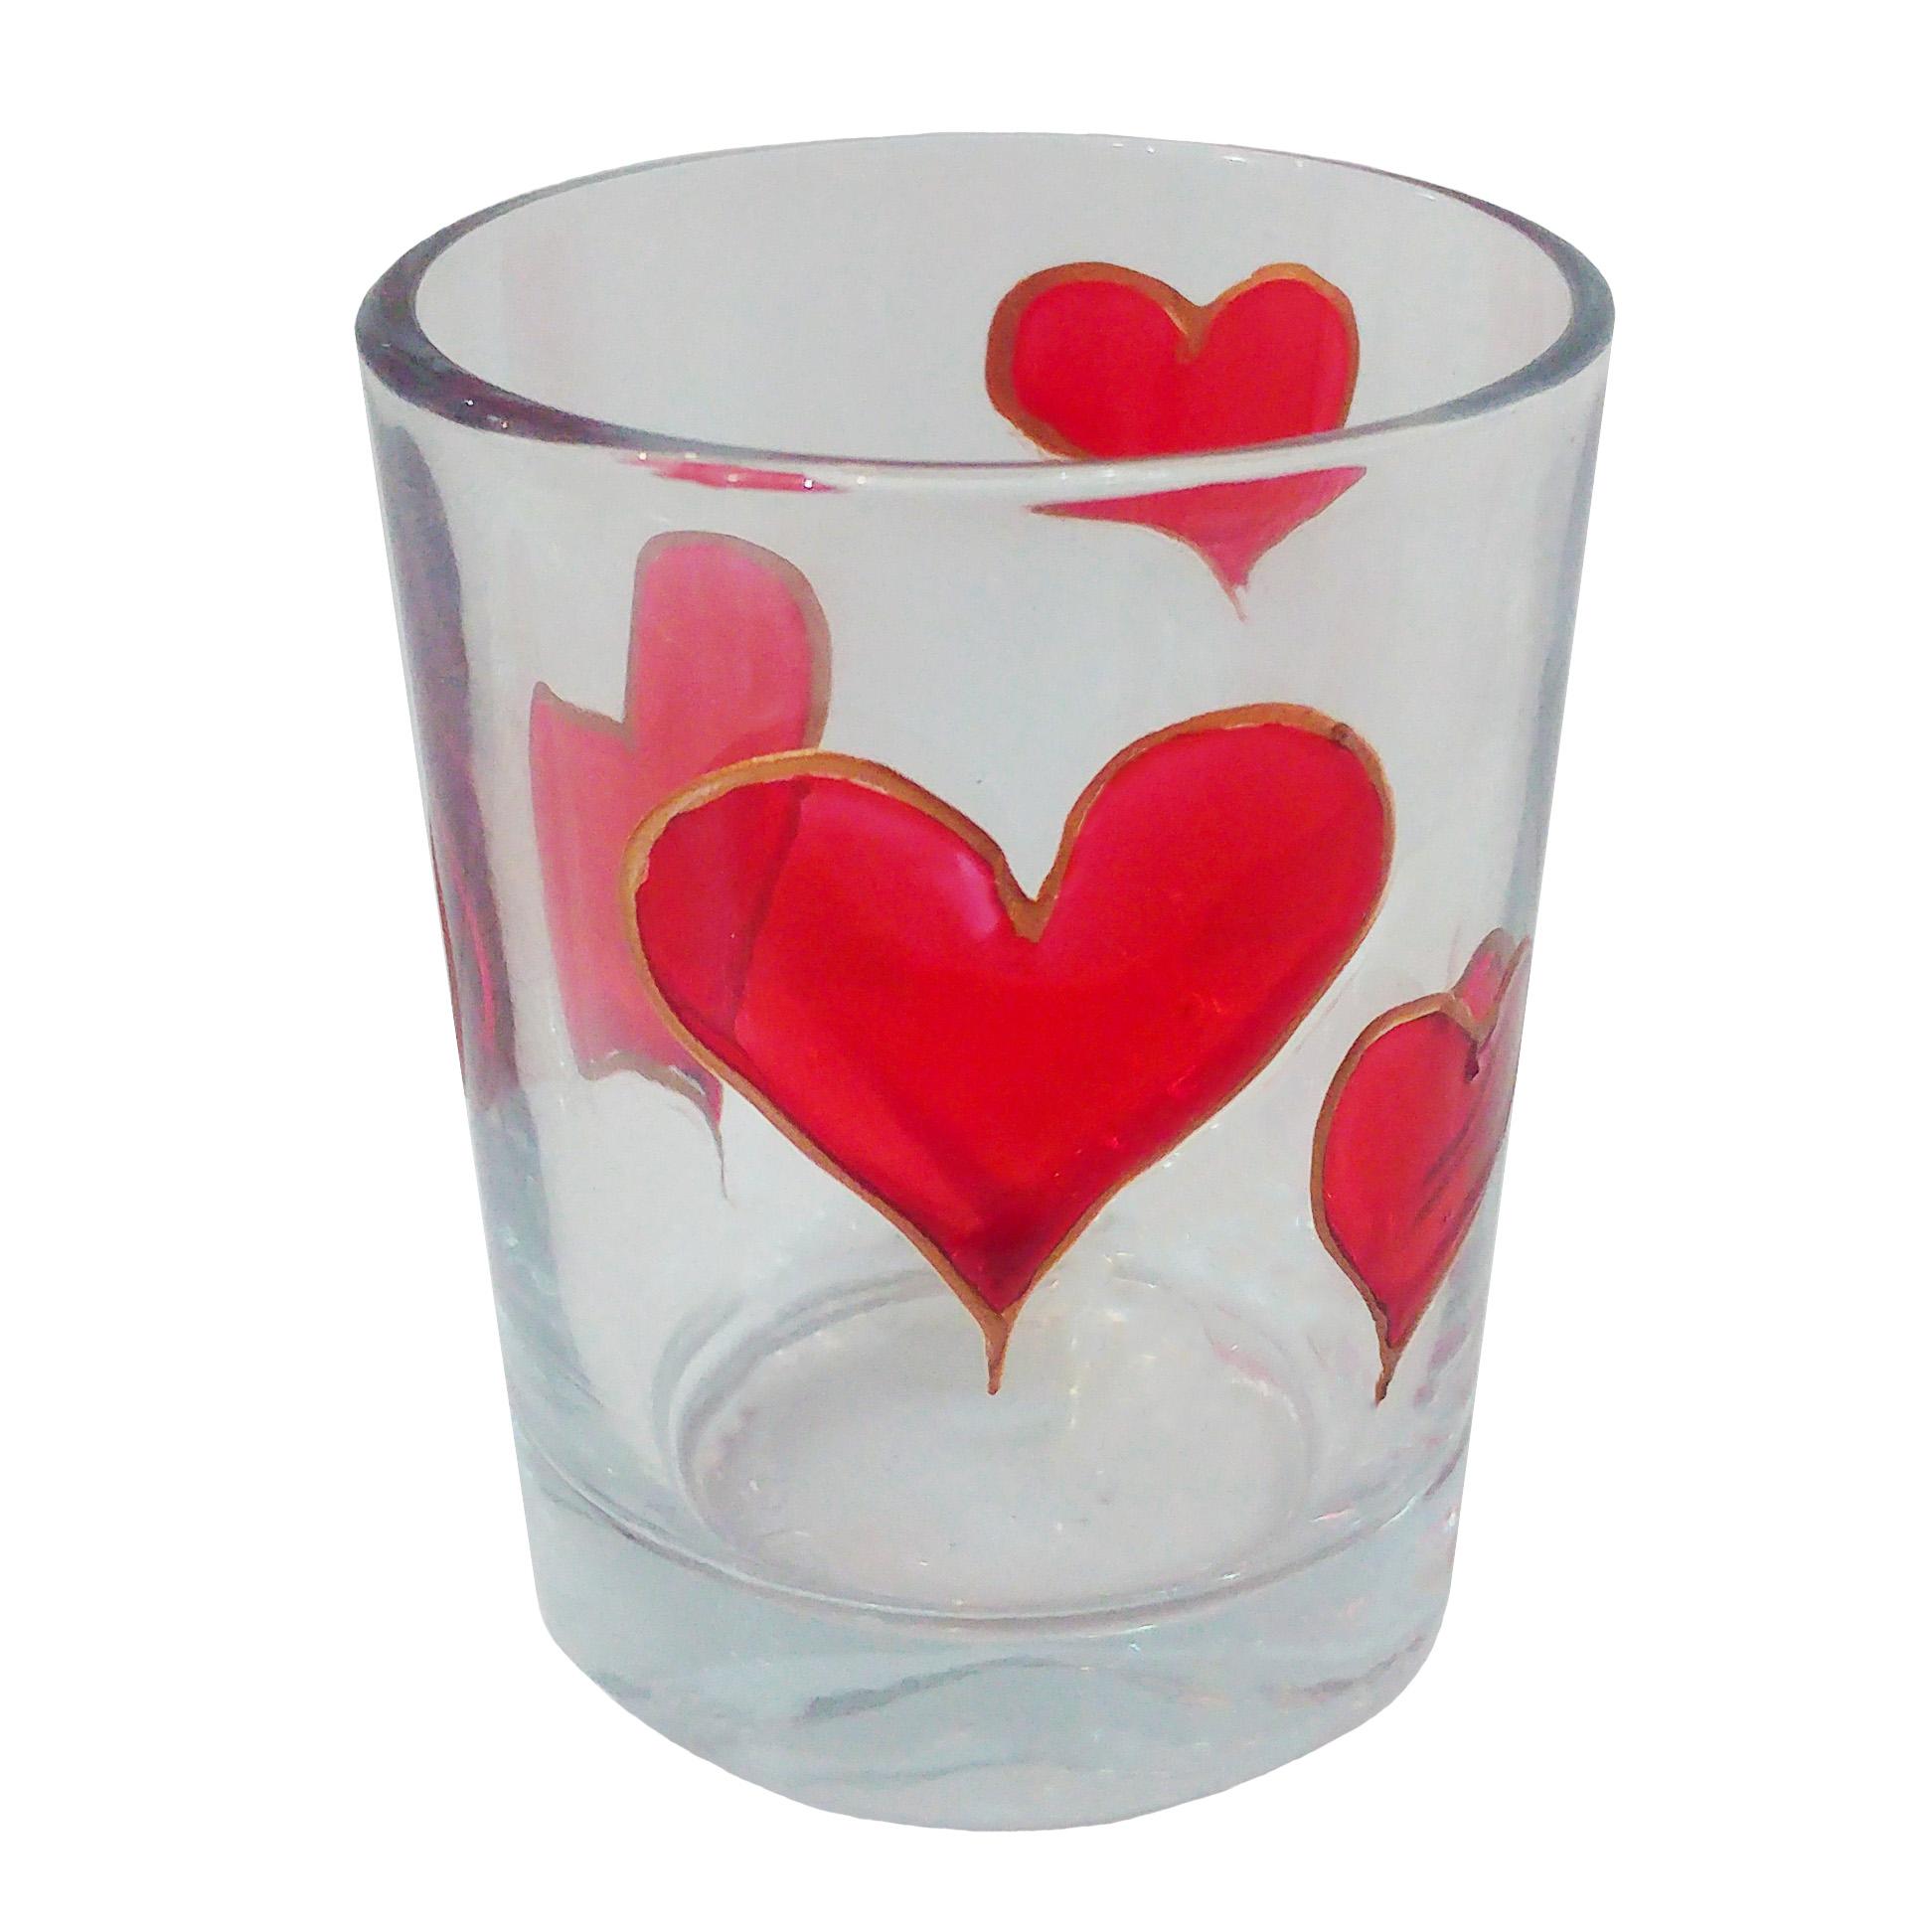 جاشمعی شیشه ای طرح قلب کد 03